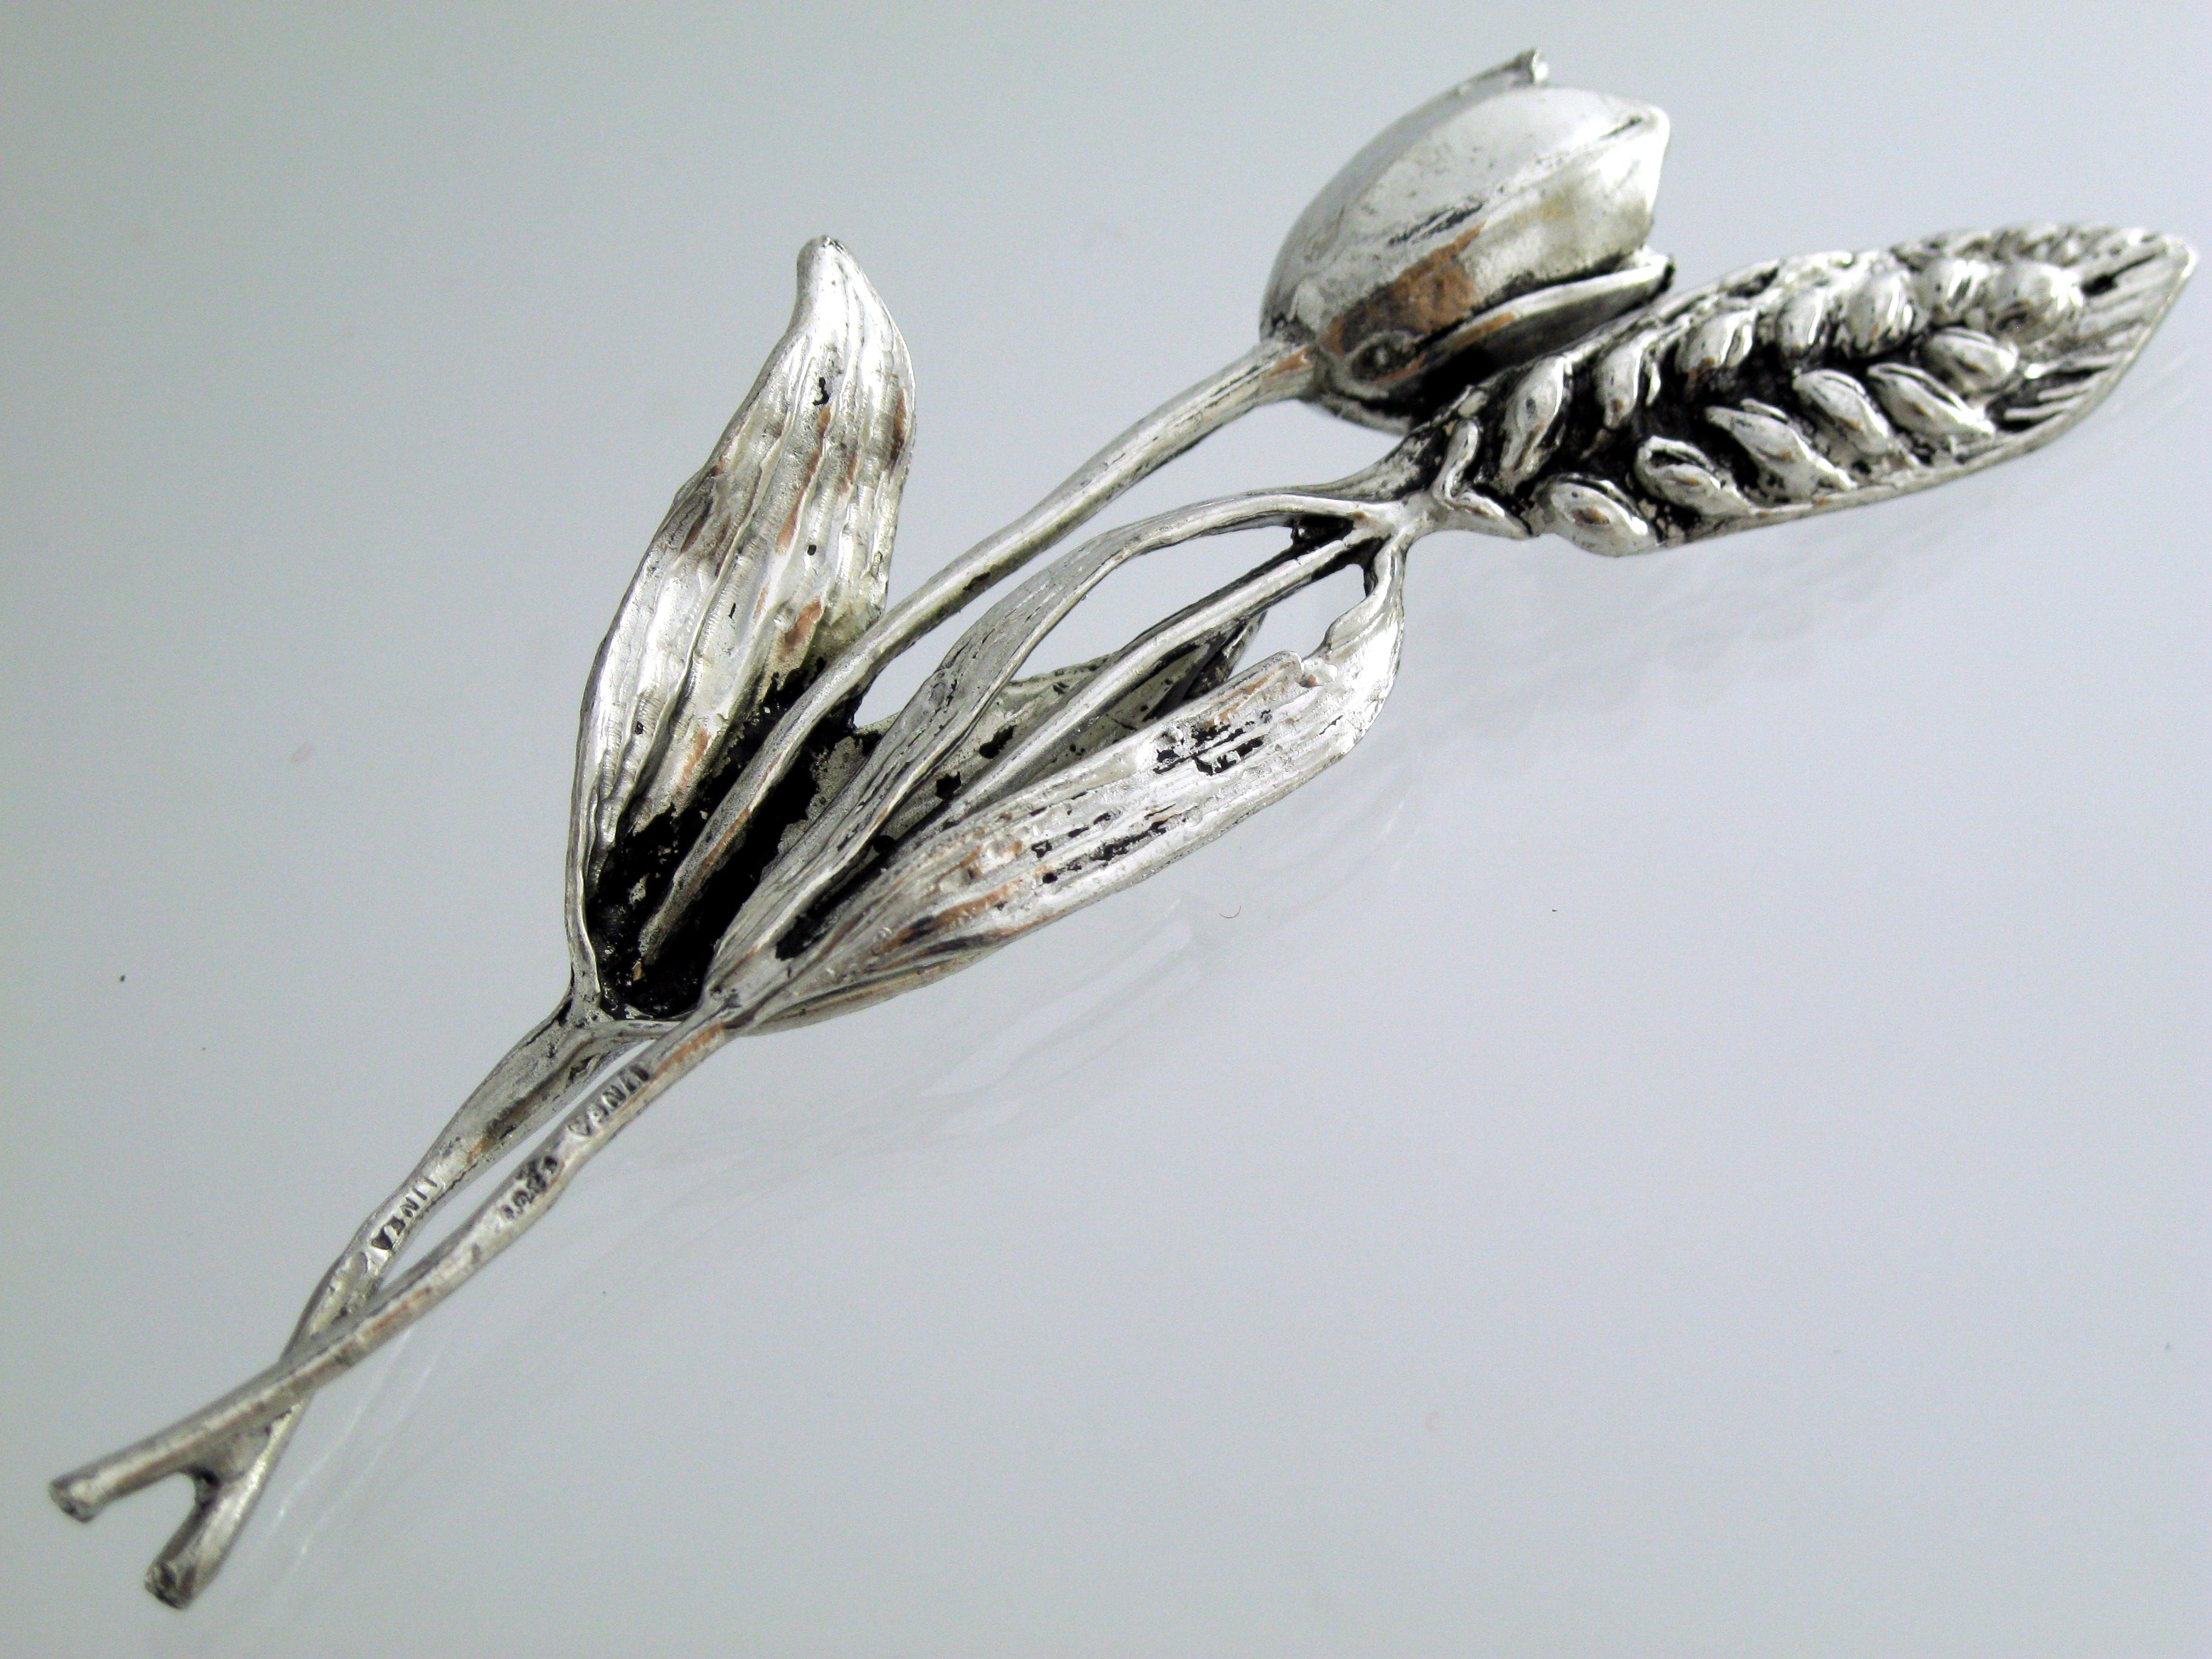 bomboniere argento spiga tulipano bomboniera comunione cresima matrimonio laurea ebay. Black Bedroom Furniture Sets. Home Design Ideas